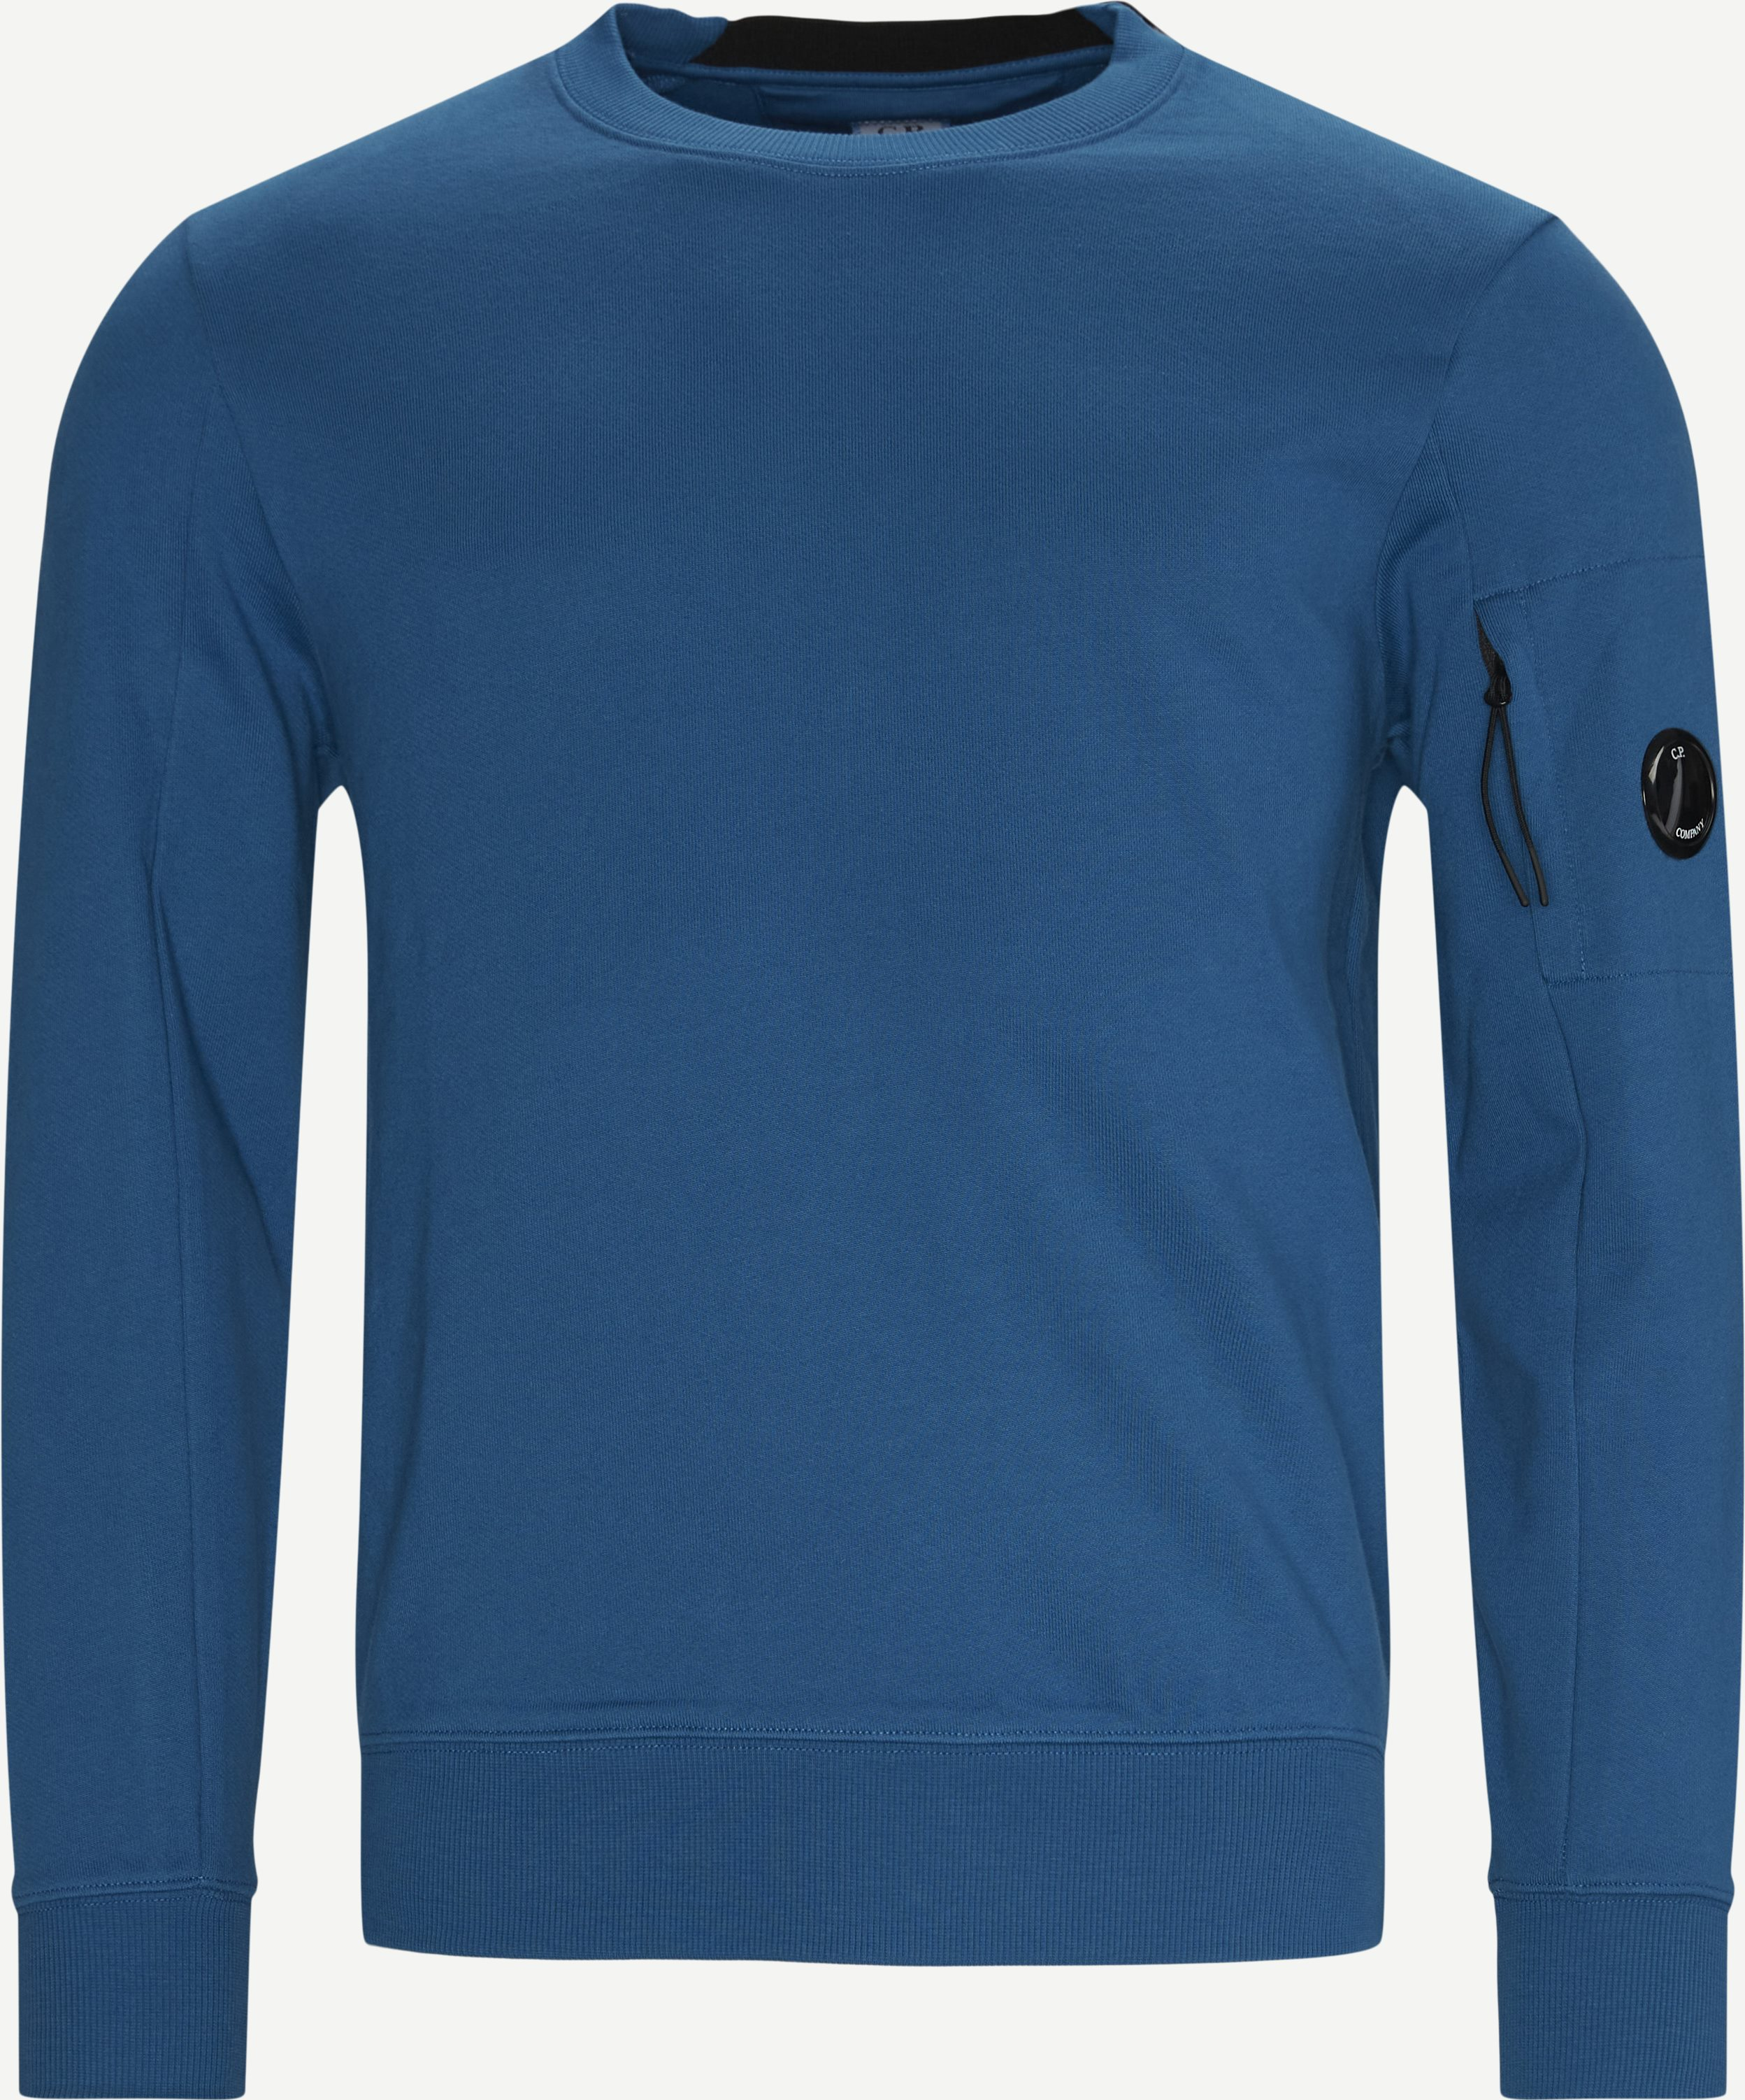 Garment Dyed Light Fleece Lens Crew Sweat - Sweatshirts - Regular - Blue